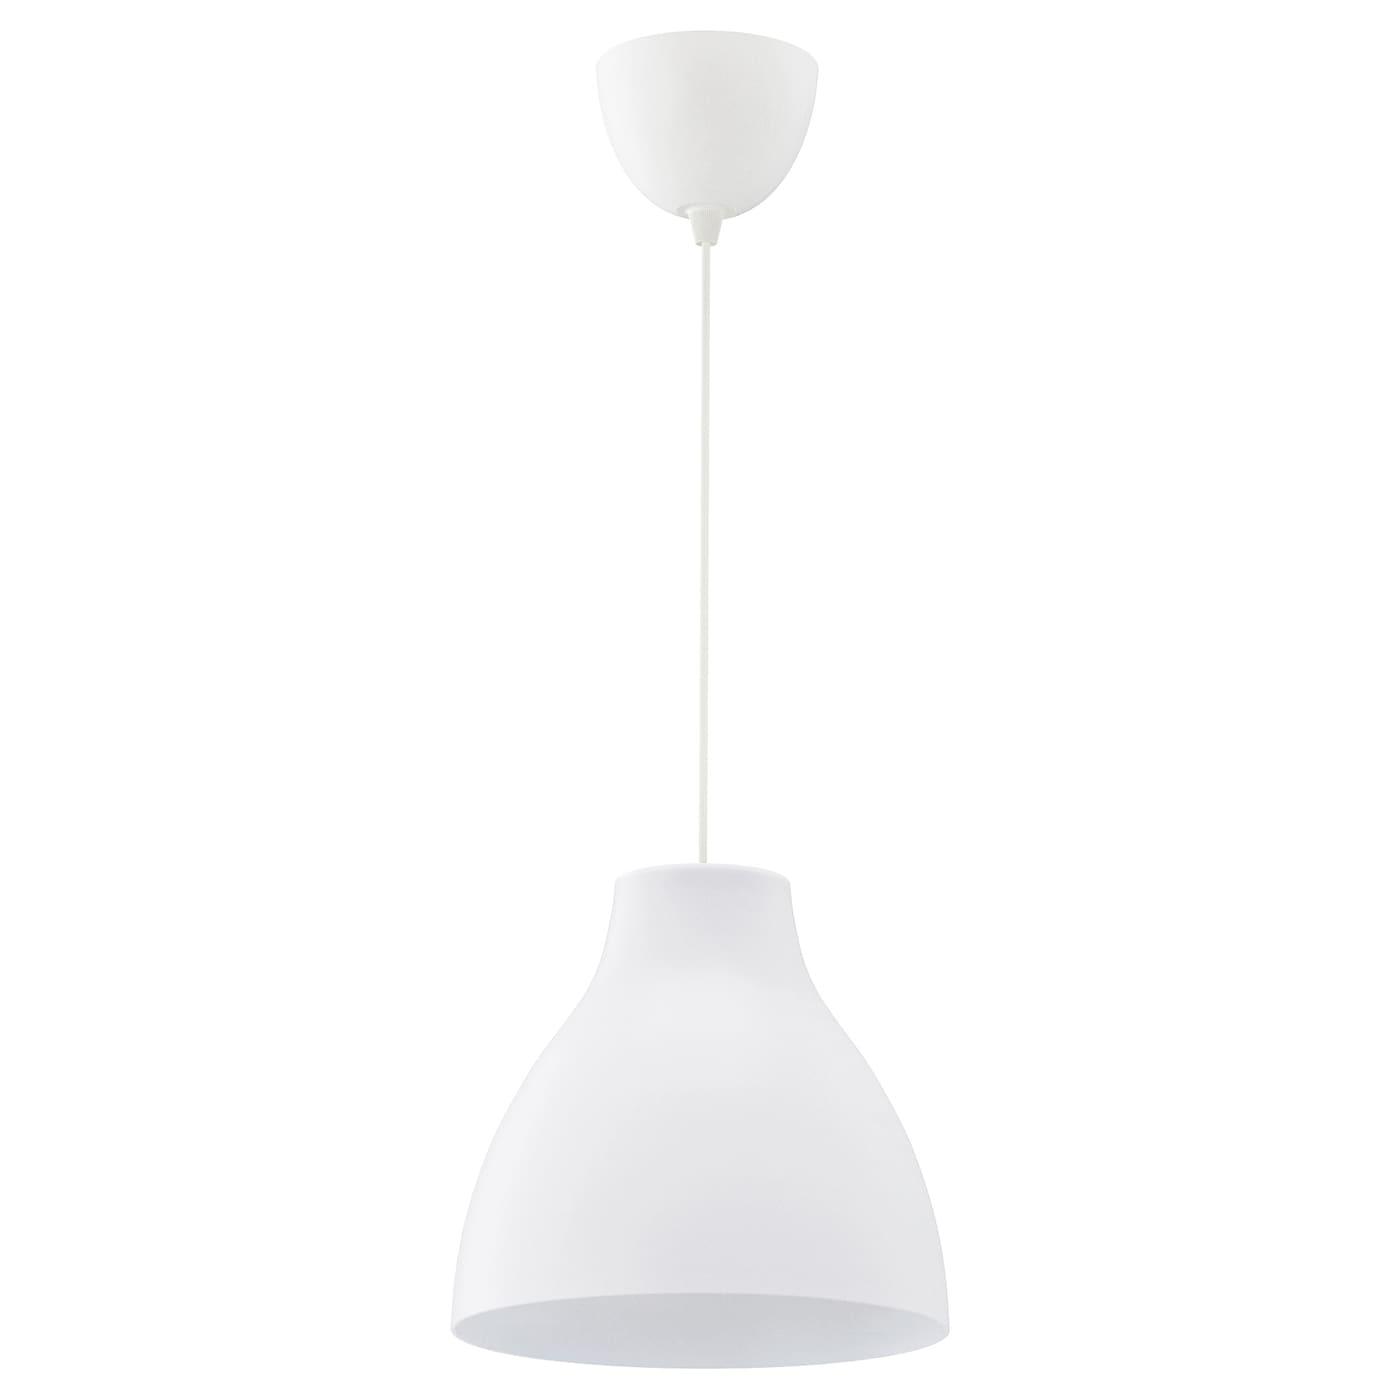 Lampadari Da Camera Matrimoniale Ikea melodi bdjobs7